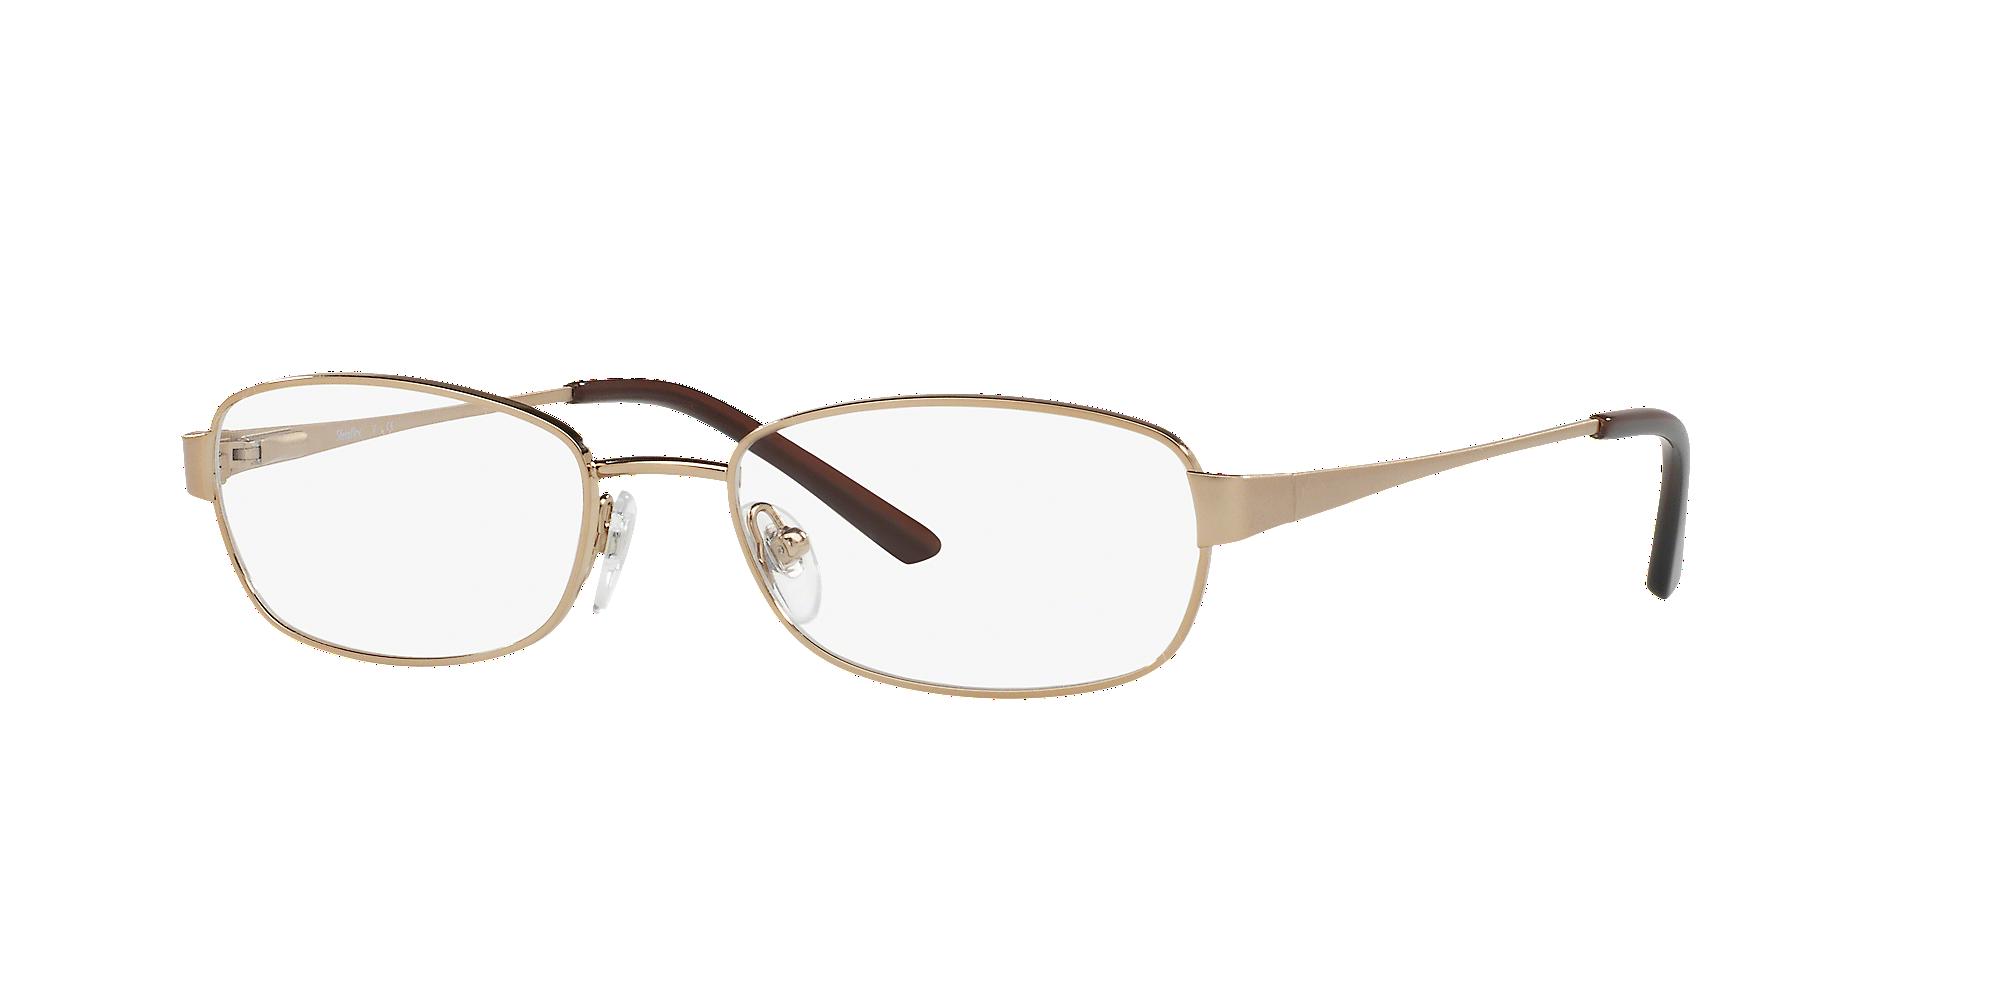 frames sferoflex sf2584 opsm